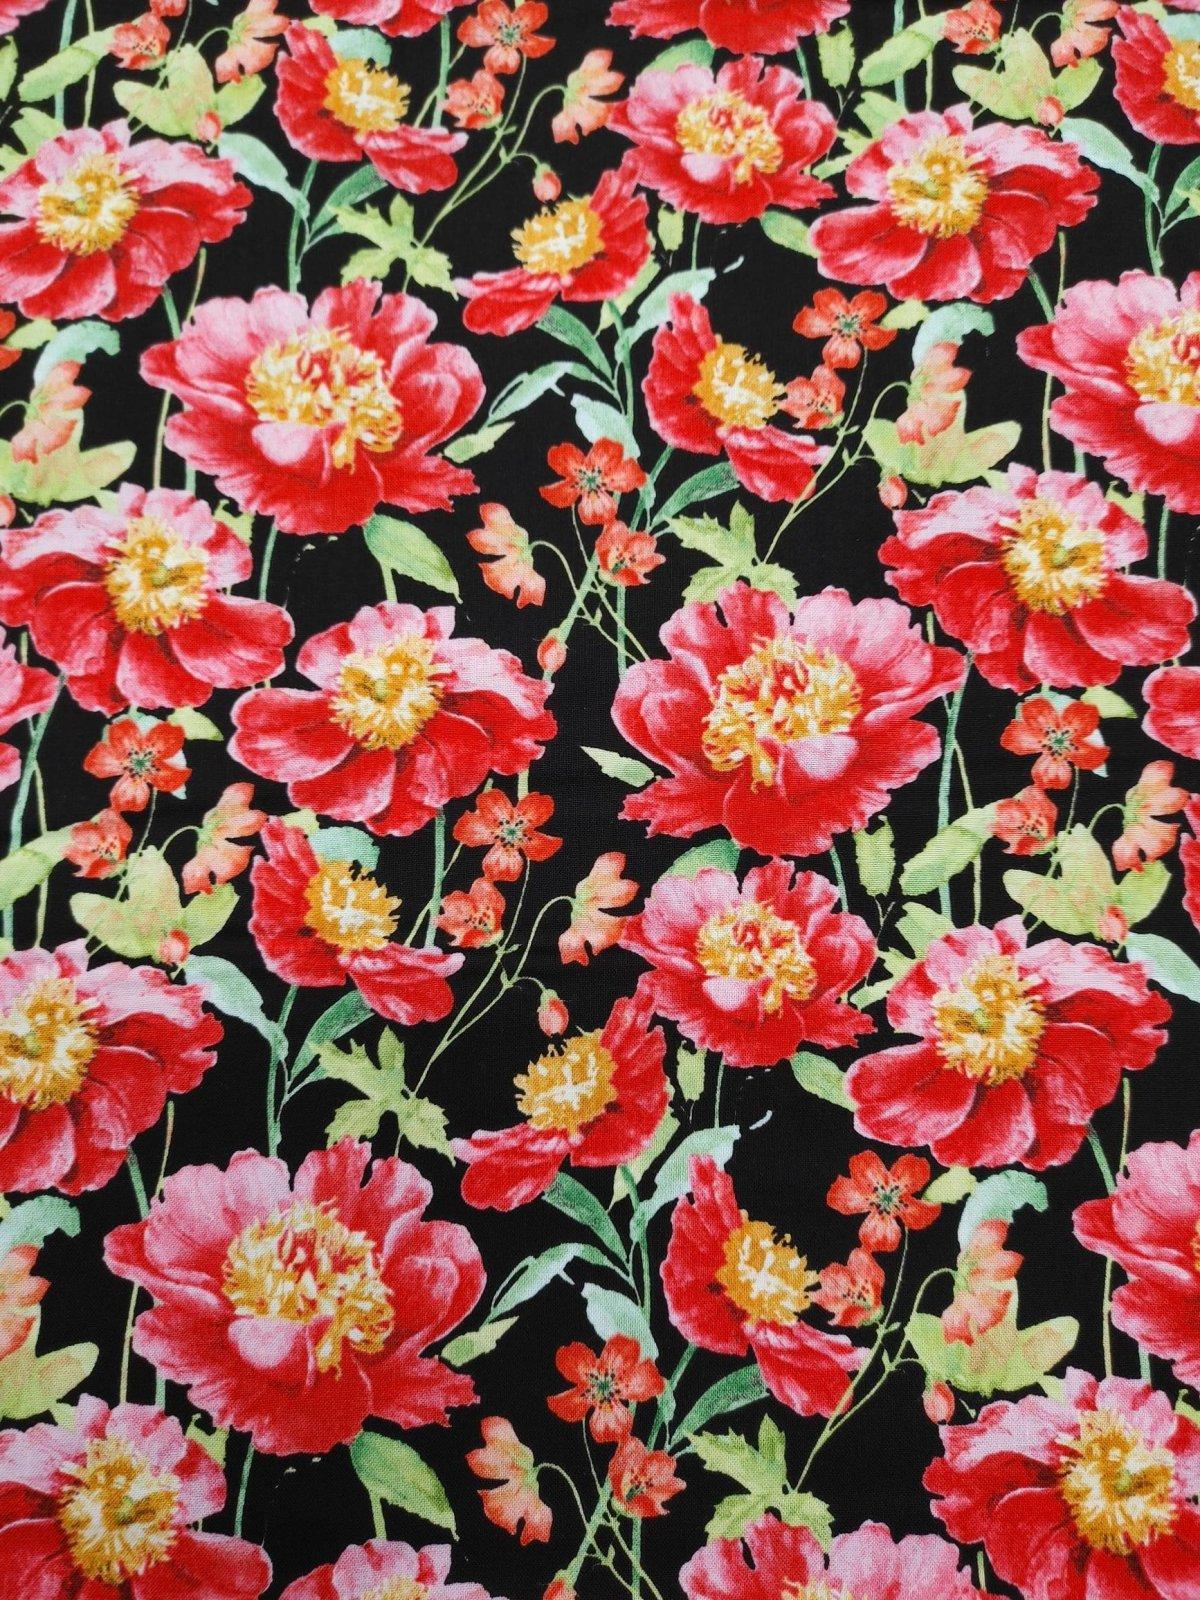 Pink Garden - Flowers on Black